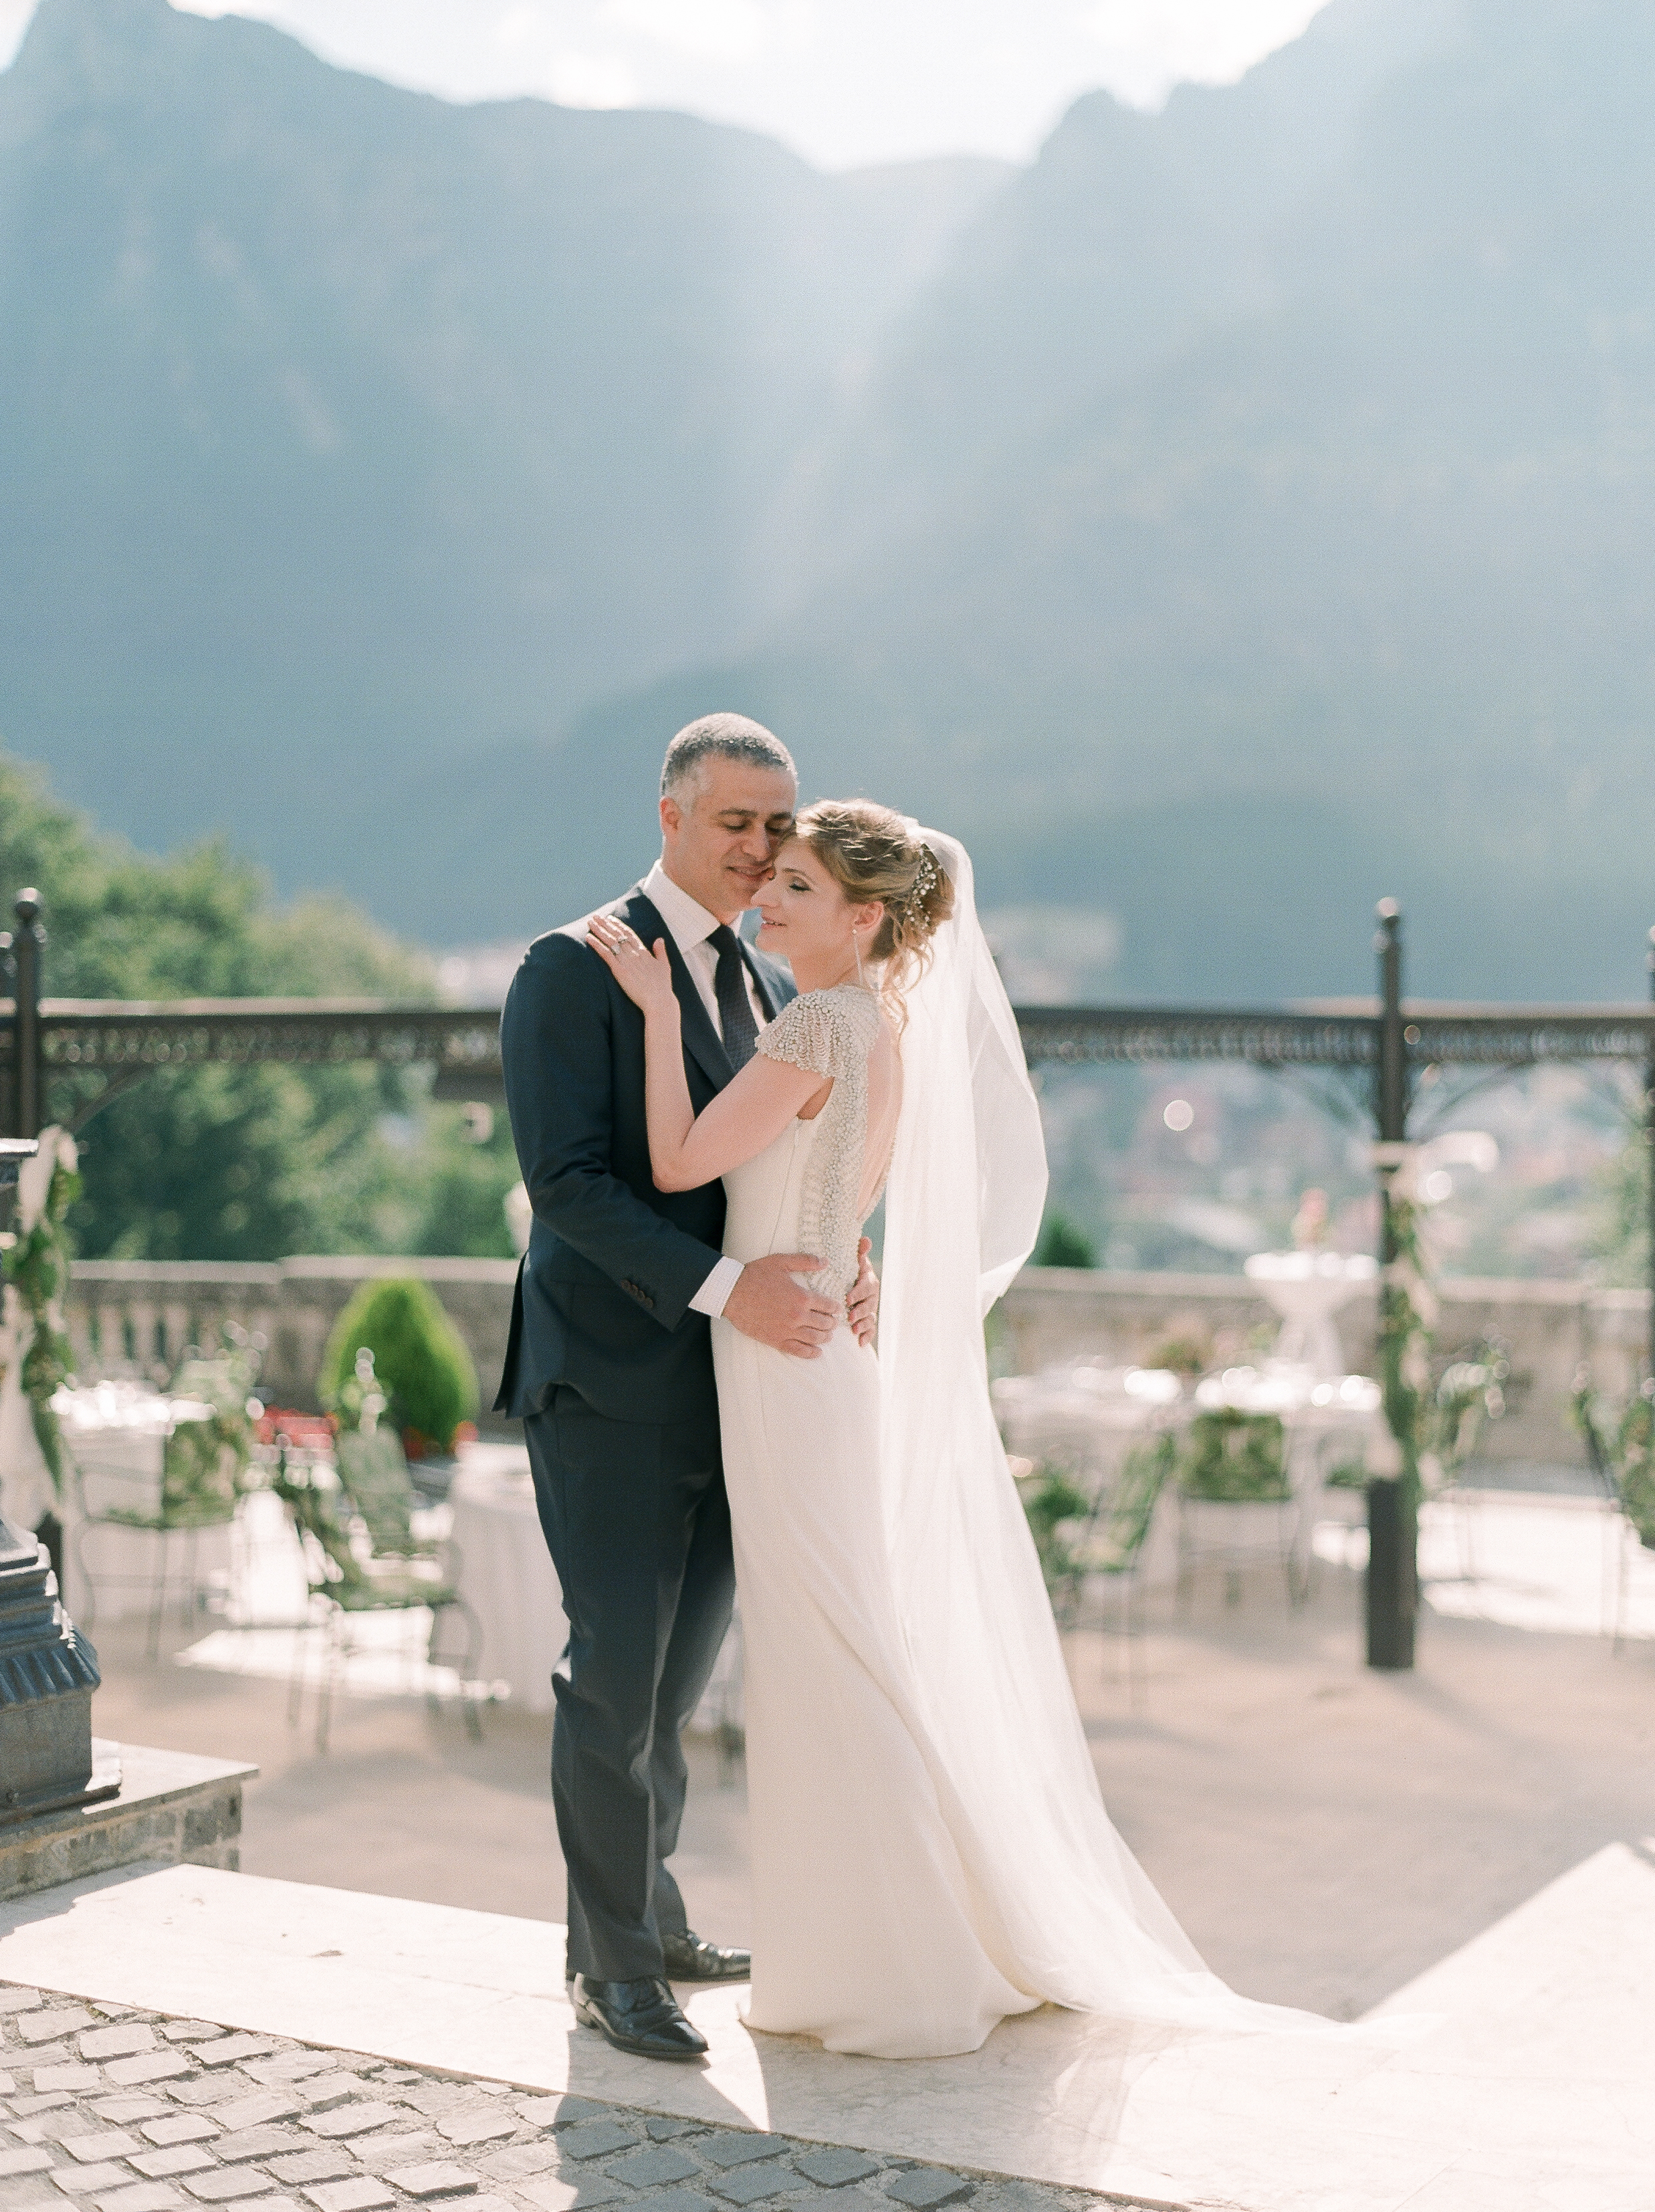 Classy Mountain Wedding in Transylvania -